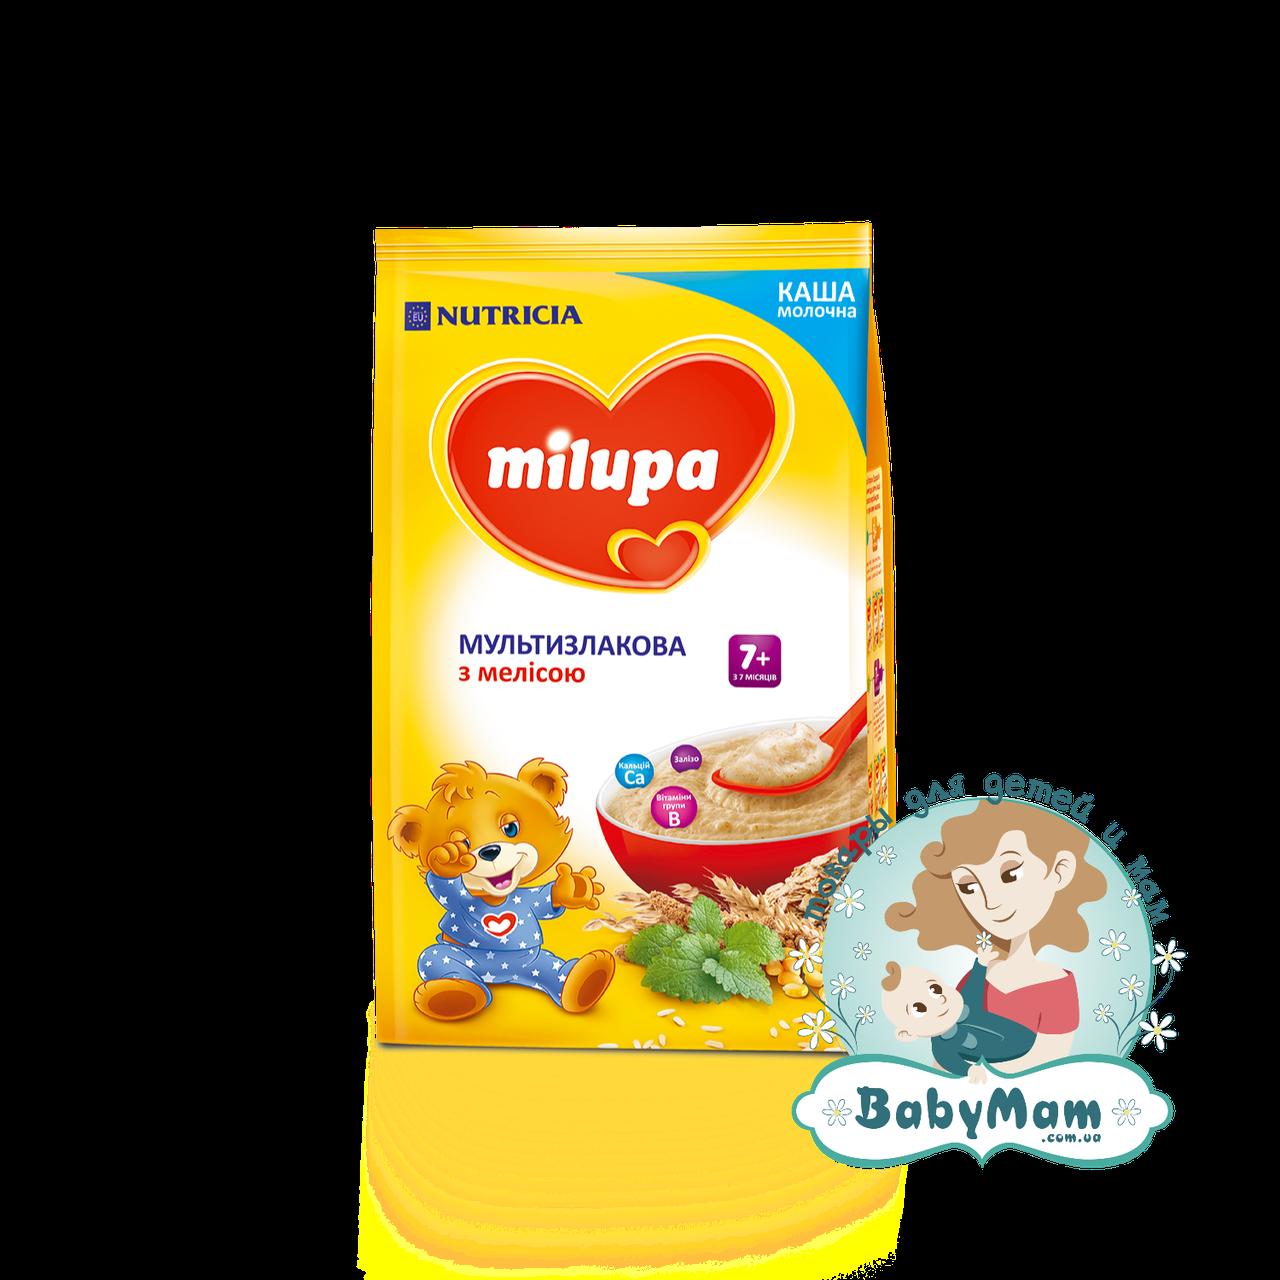 Каша молочная Milupa мультизлаковая с мелисой, 7+, 210гр